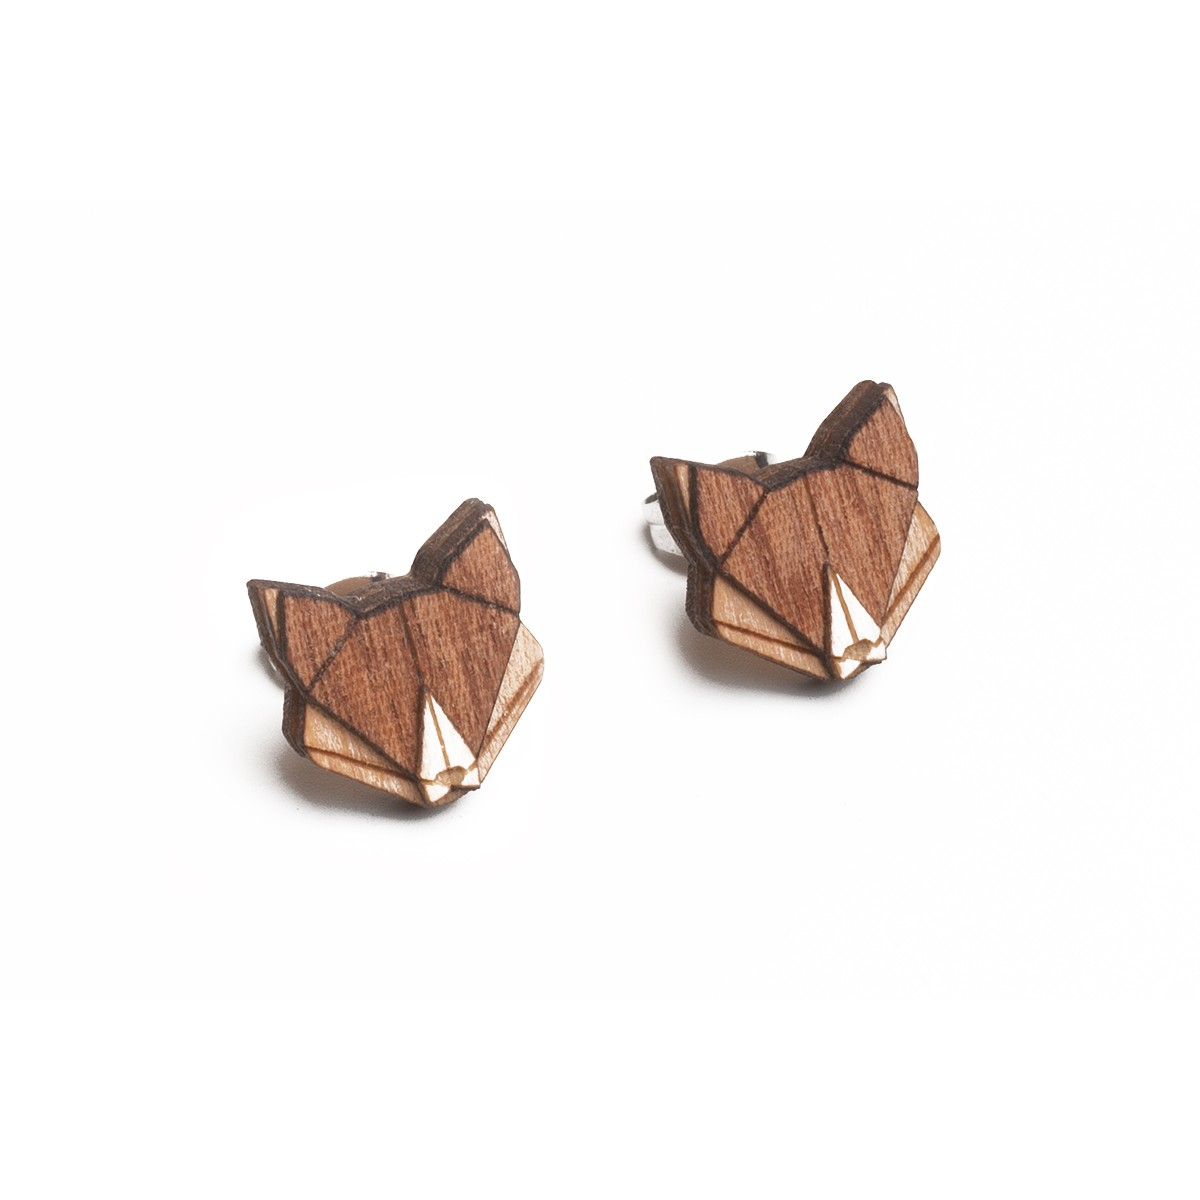 BeWooden Ohrstecker - Ohringe aus Holz - Fox Earrings